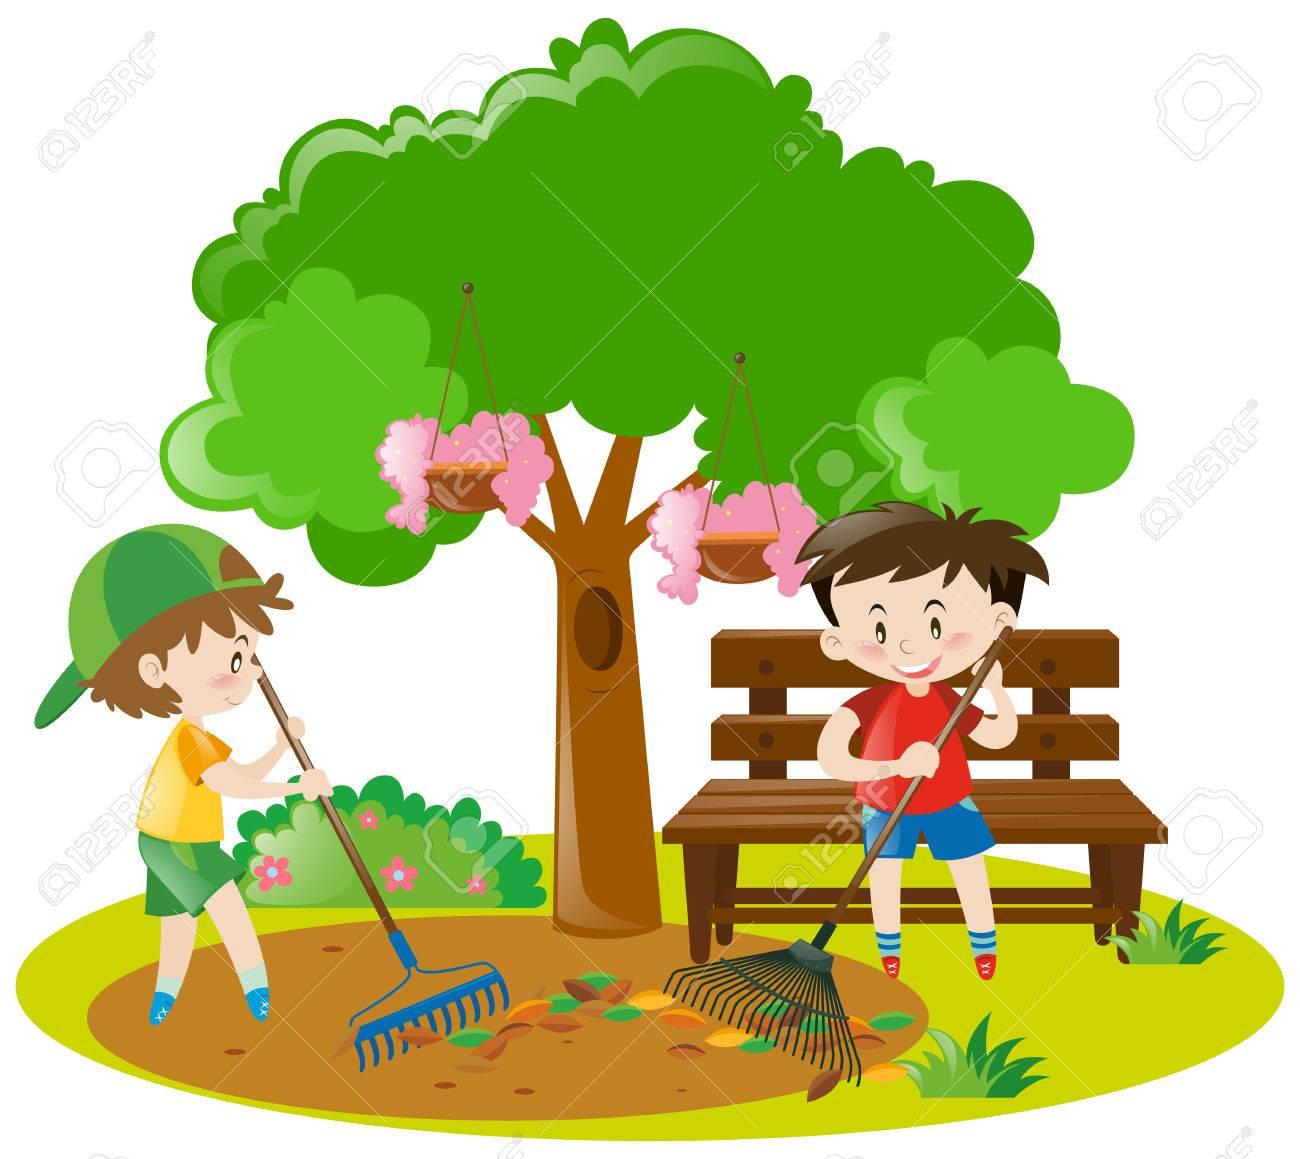 hight resolution of two boys raking leaves in garden illustration stock vector 63486855